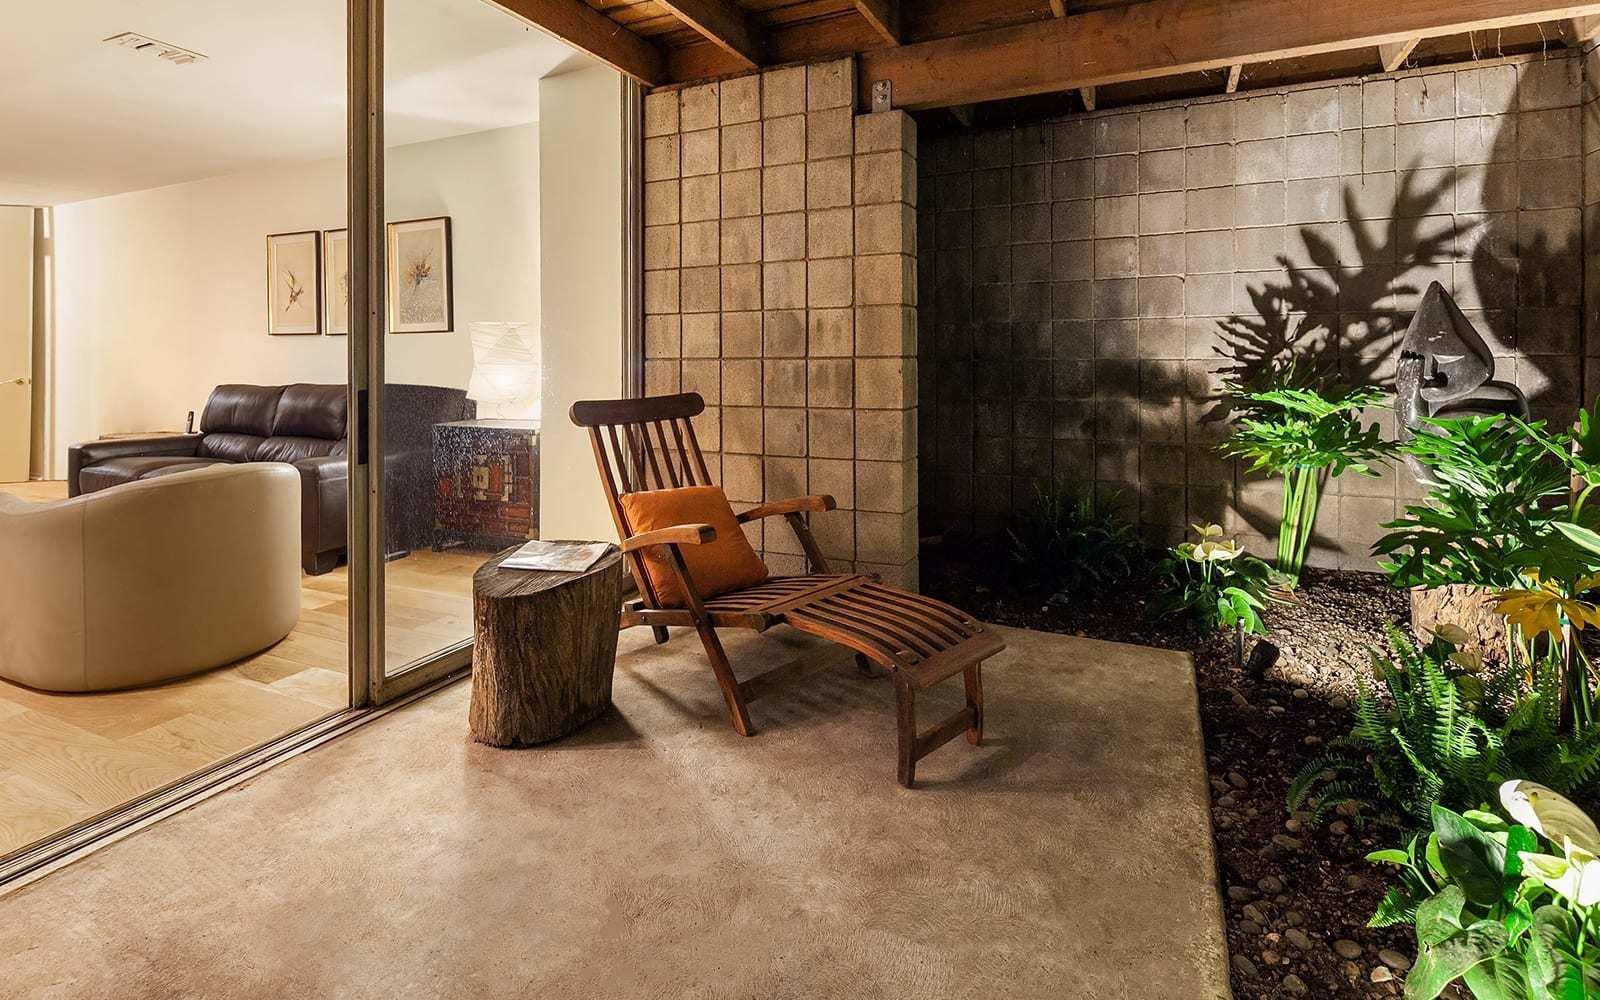 Midcentury House by Vernon F. Duckett patio